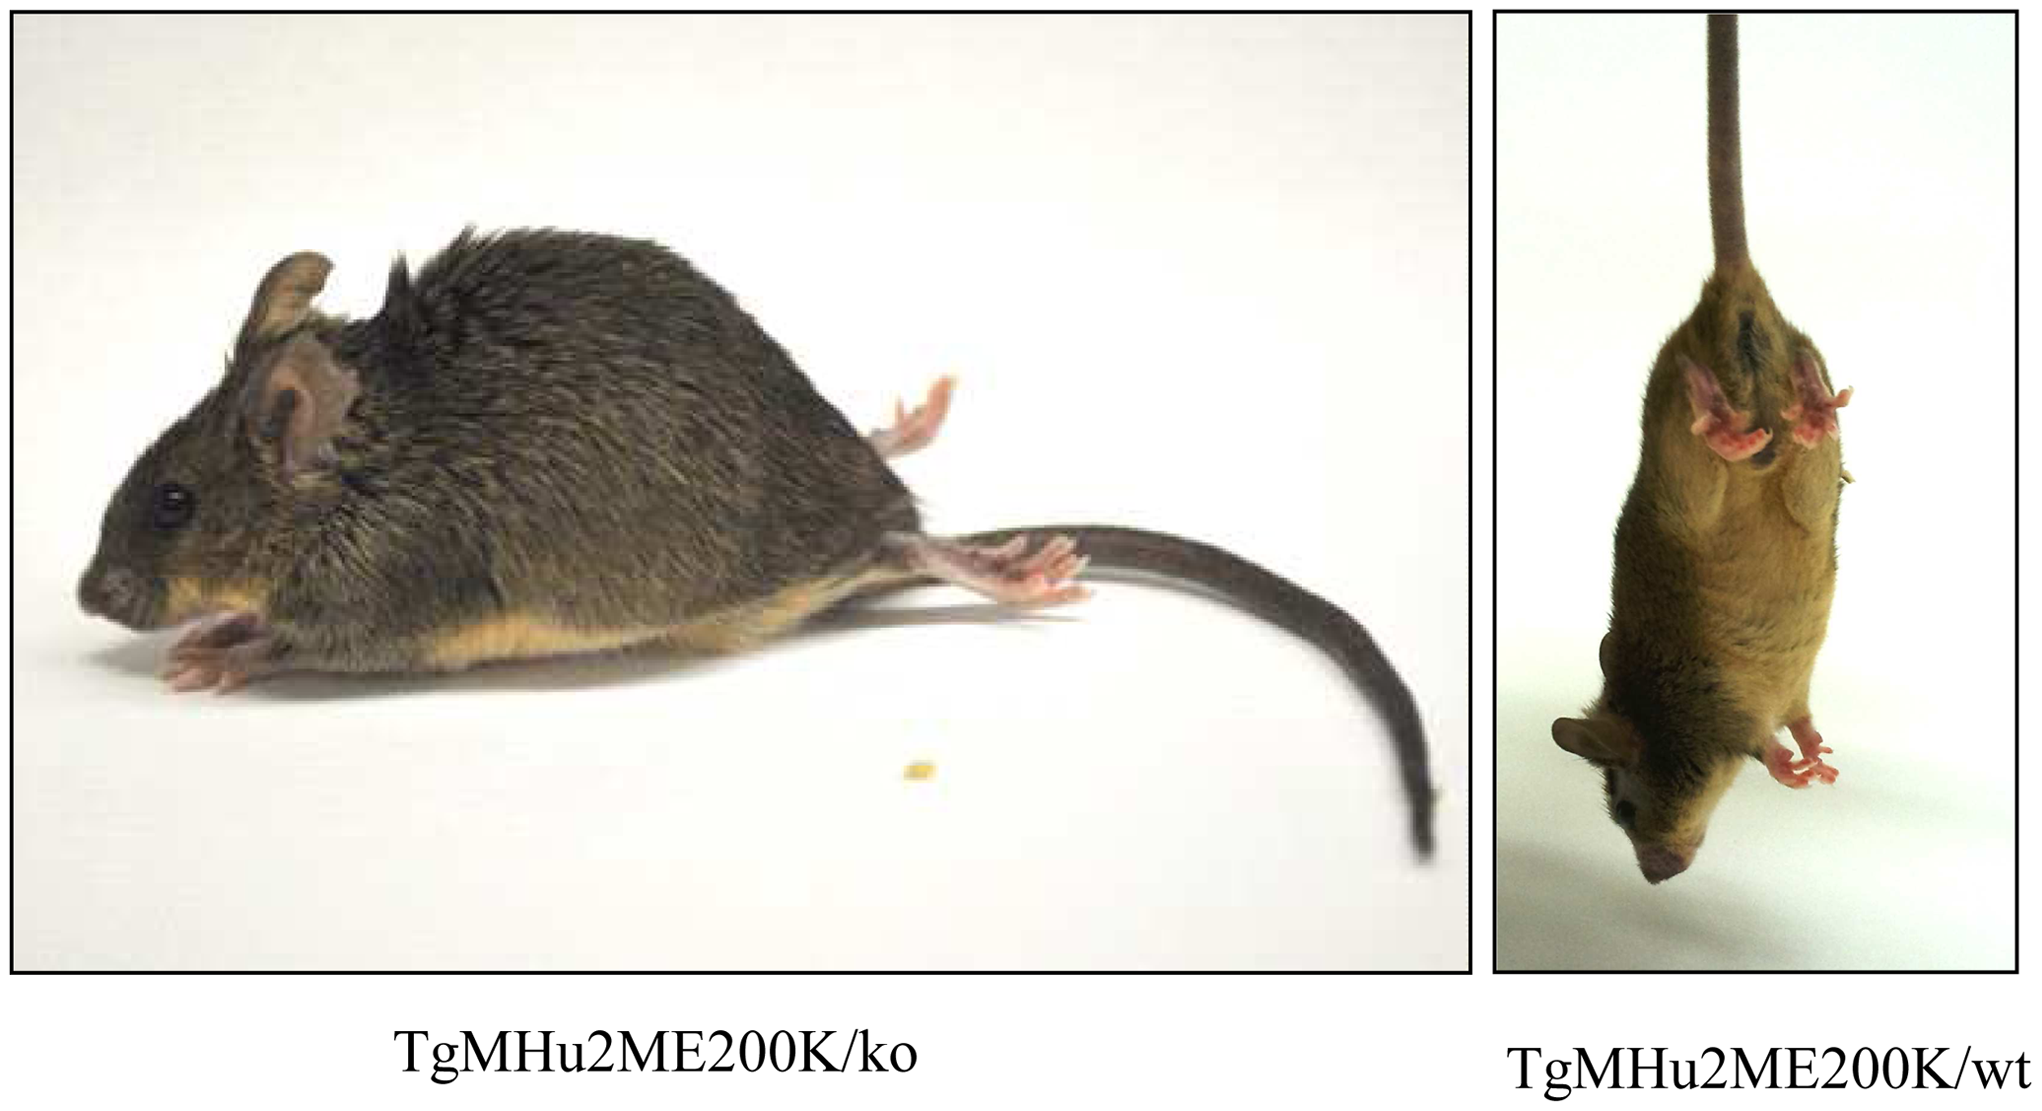 Clinical Characterization of spontaneous disease in TgMHu2ME199K mice.